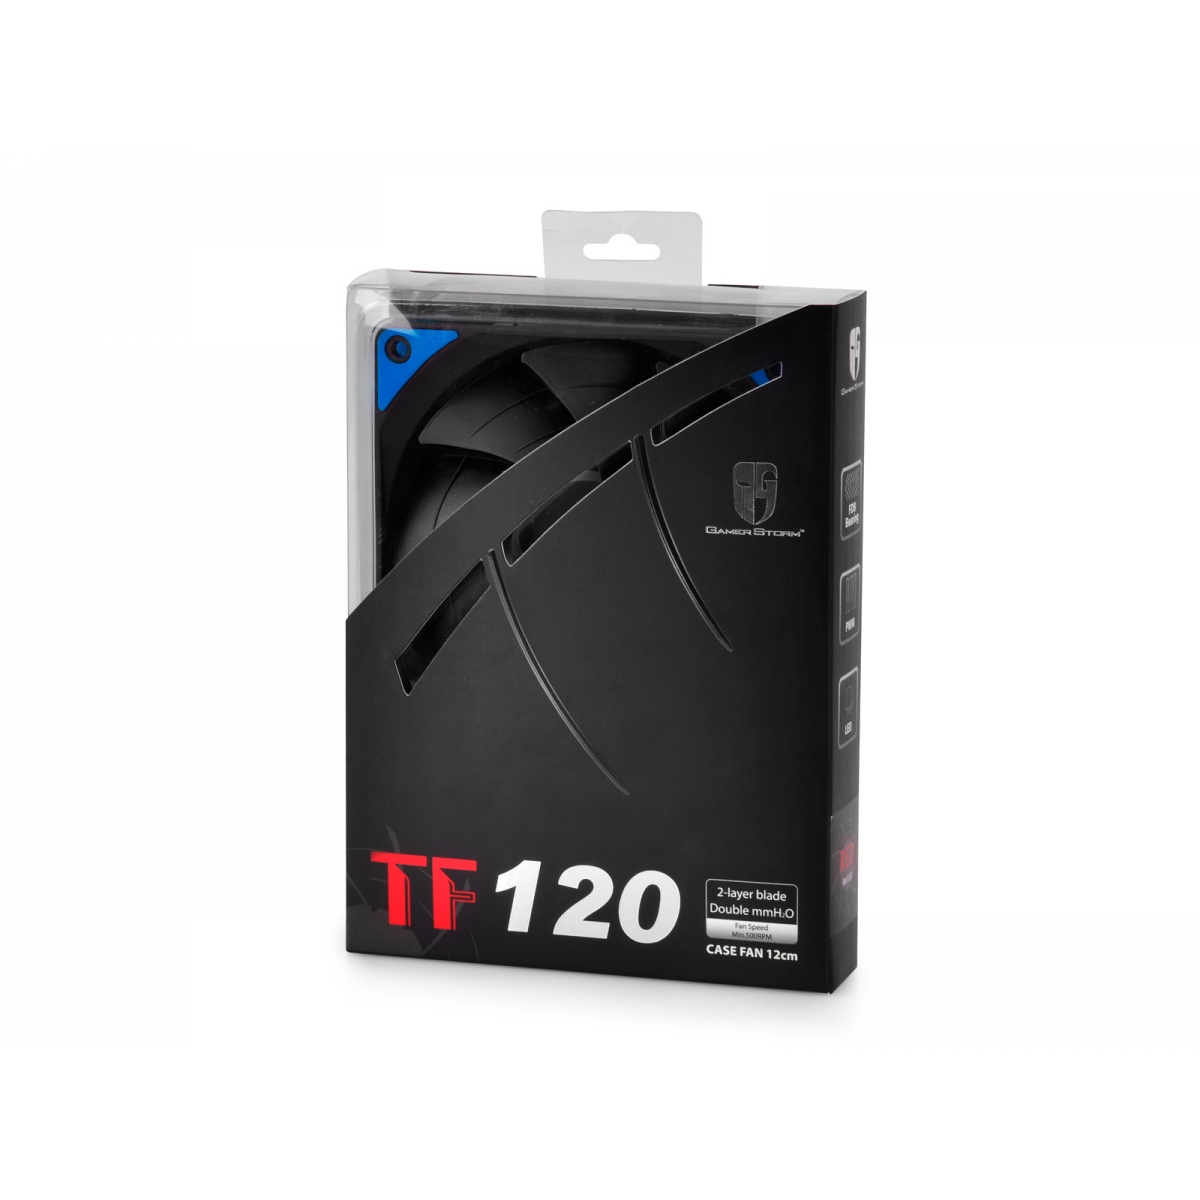 Cooler para Gabinete Gamer Storm Deepcool, LED Blue 120mm, DPGS-FTF-TF120BG